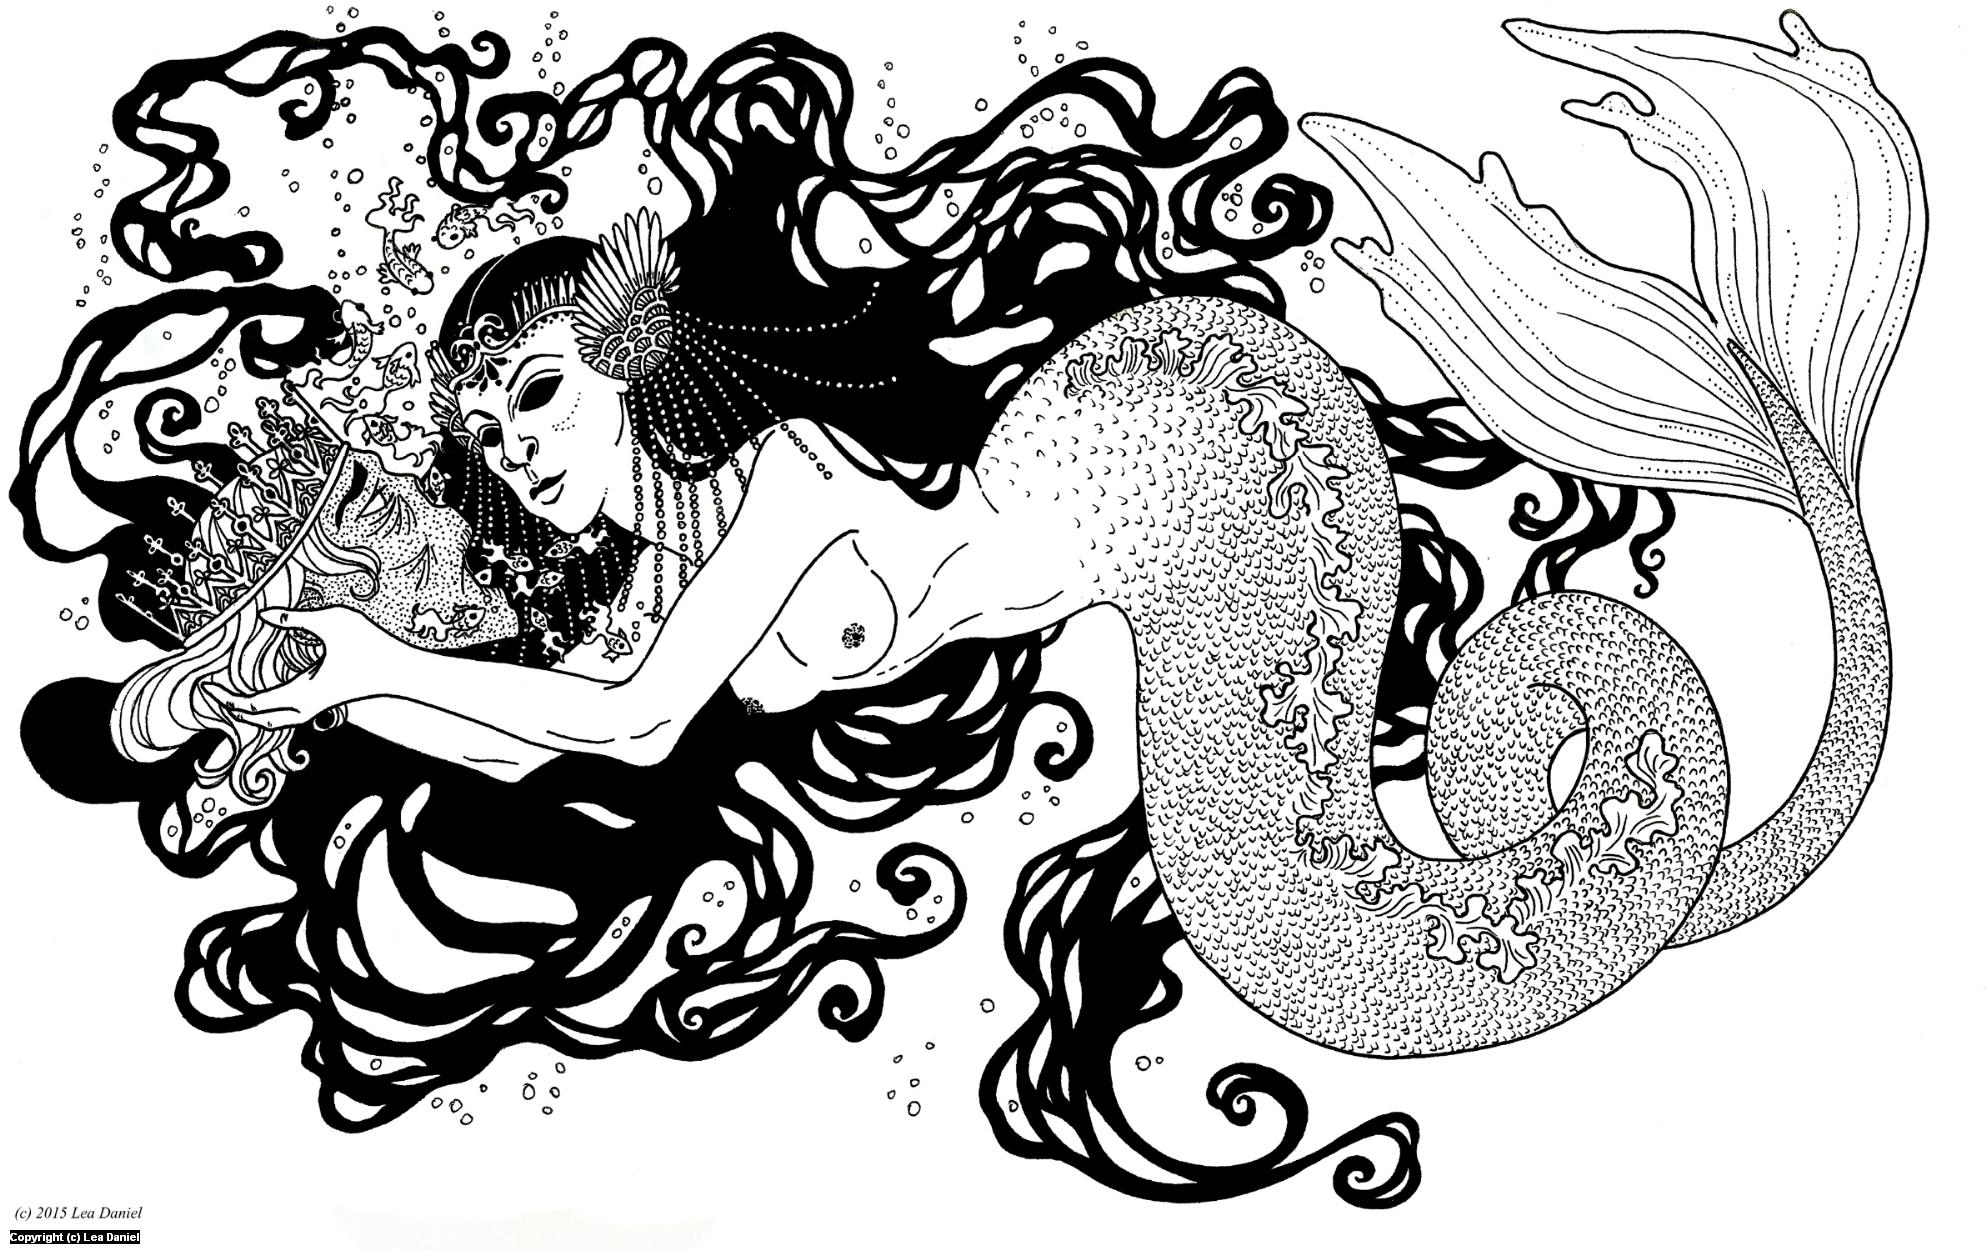 Mermaid and Prince Artwork by Anastasiia Antonova